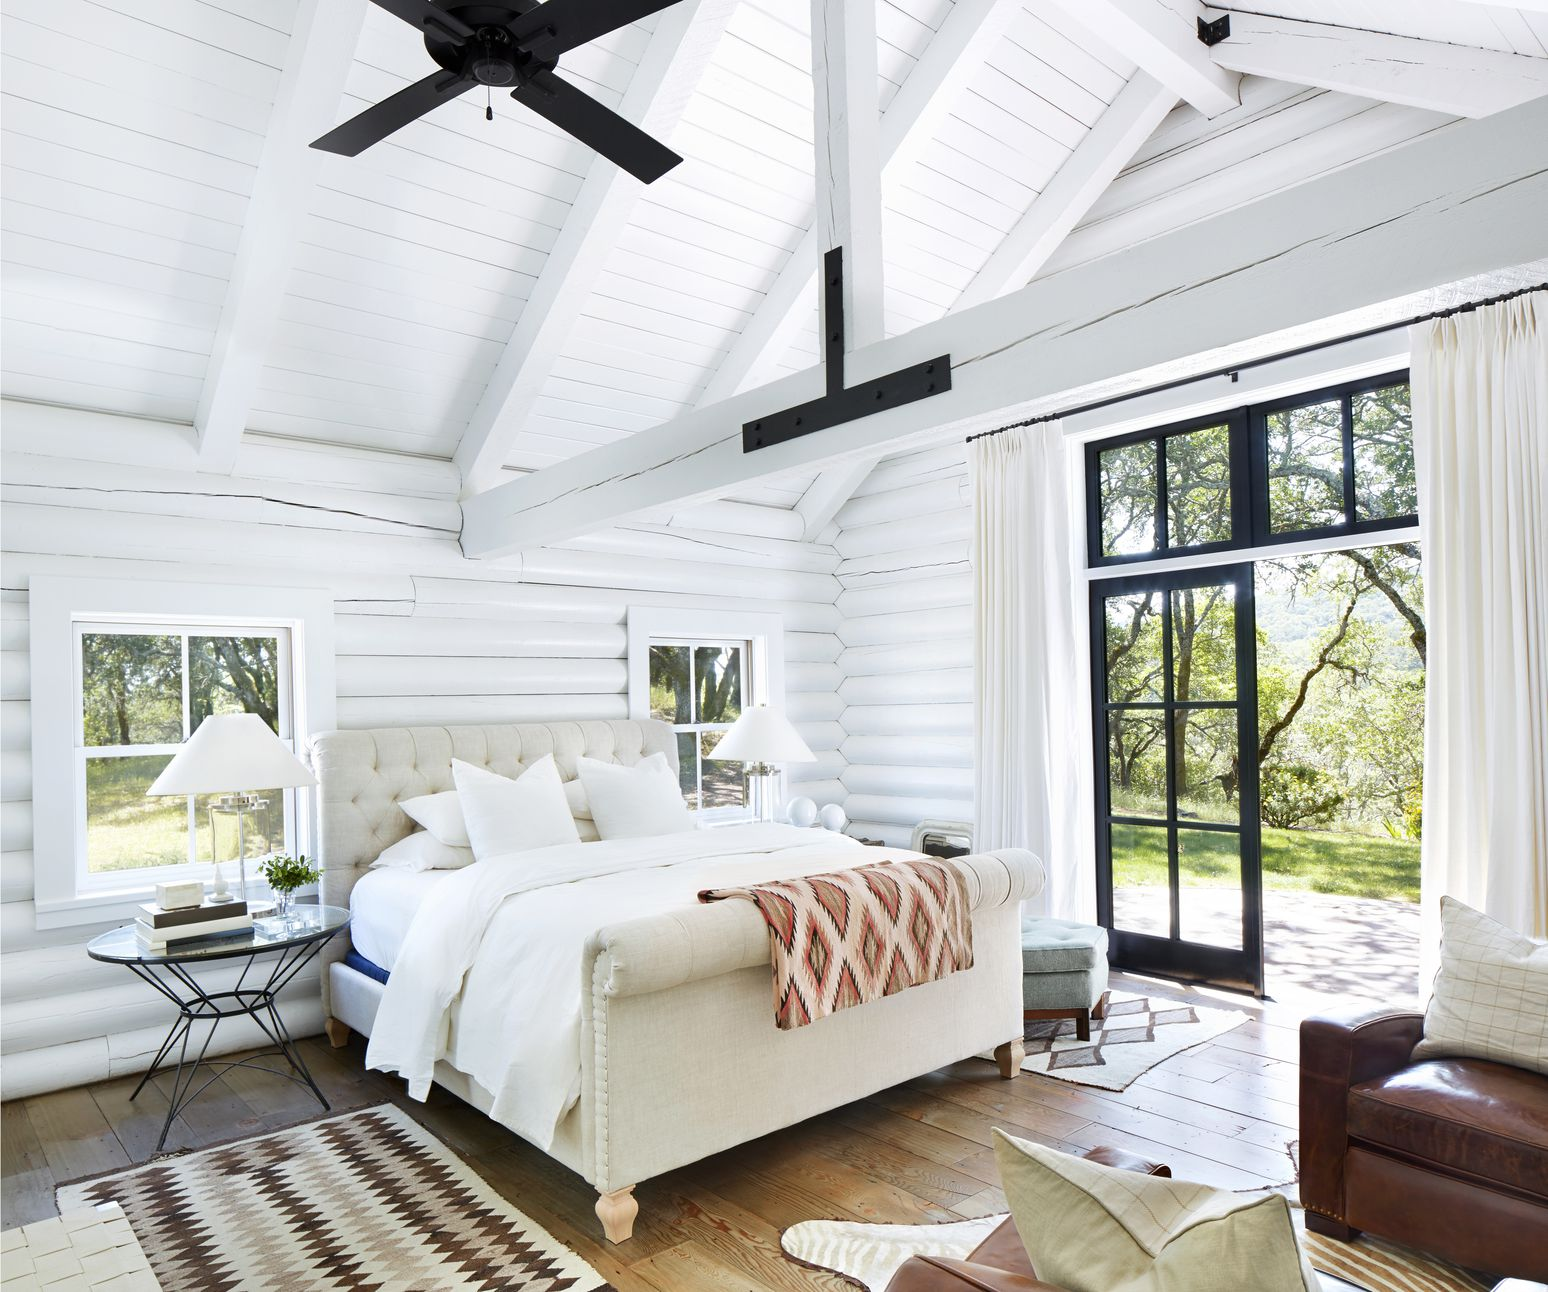 Best Rental Home Websites: Keep Your Bedroom Clean To Help Prevent Allergies